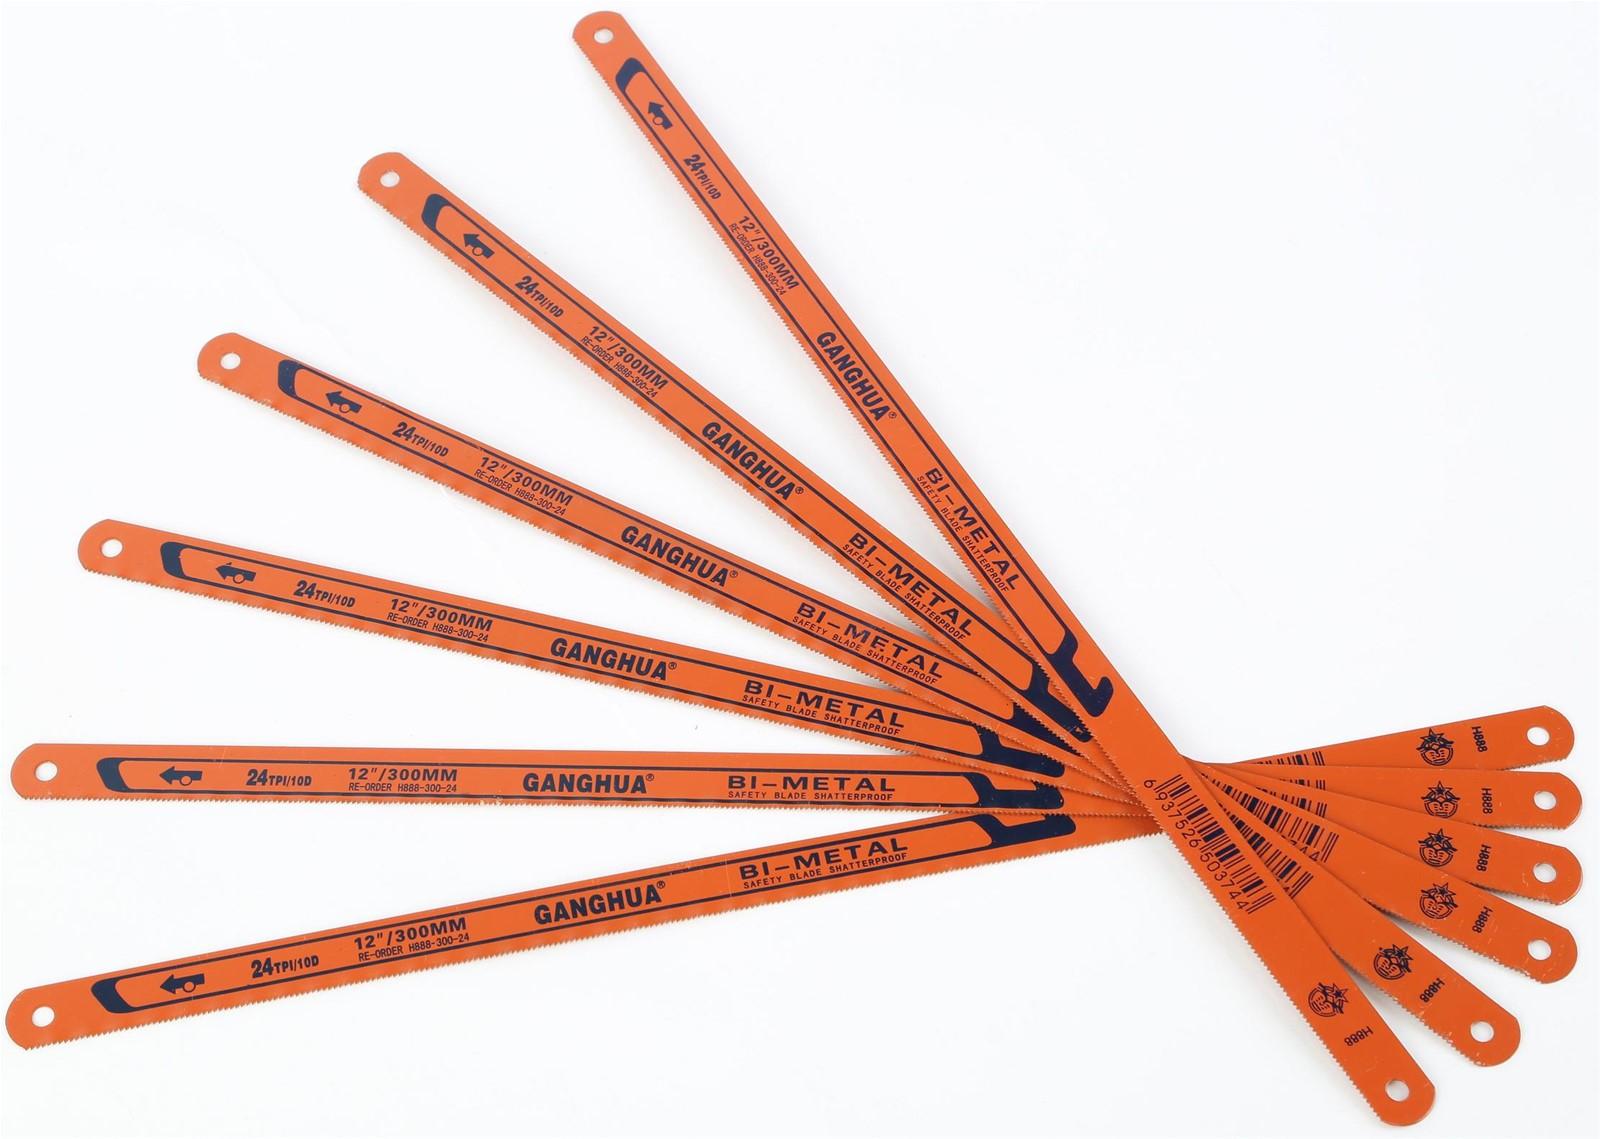 Hacksaw Blade / flexible bimetal hss Hacksaw Blade